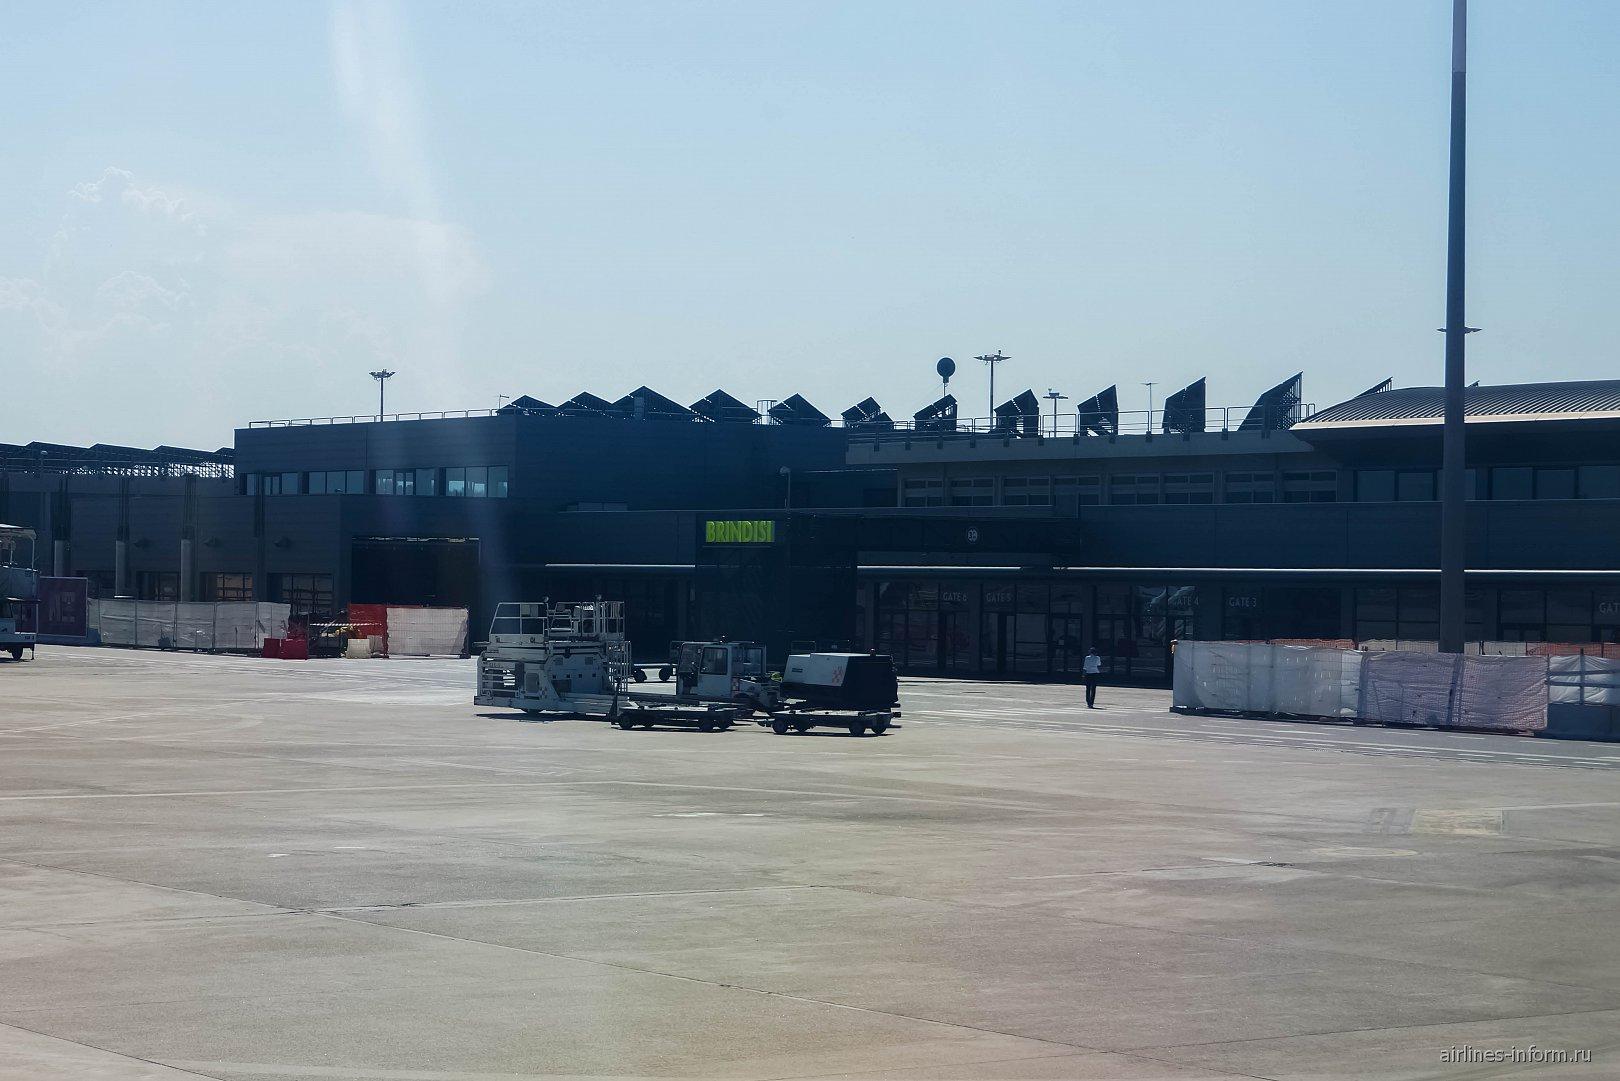 Аэровокзал аэропорта Бриндизи Саленто